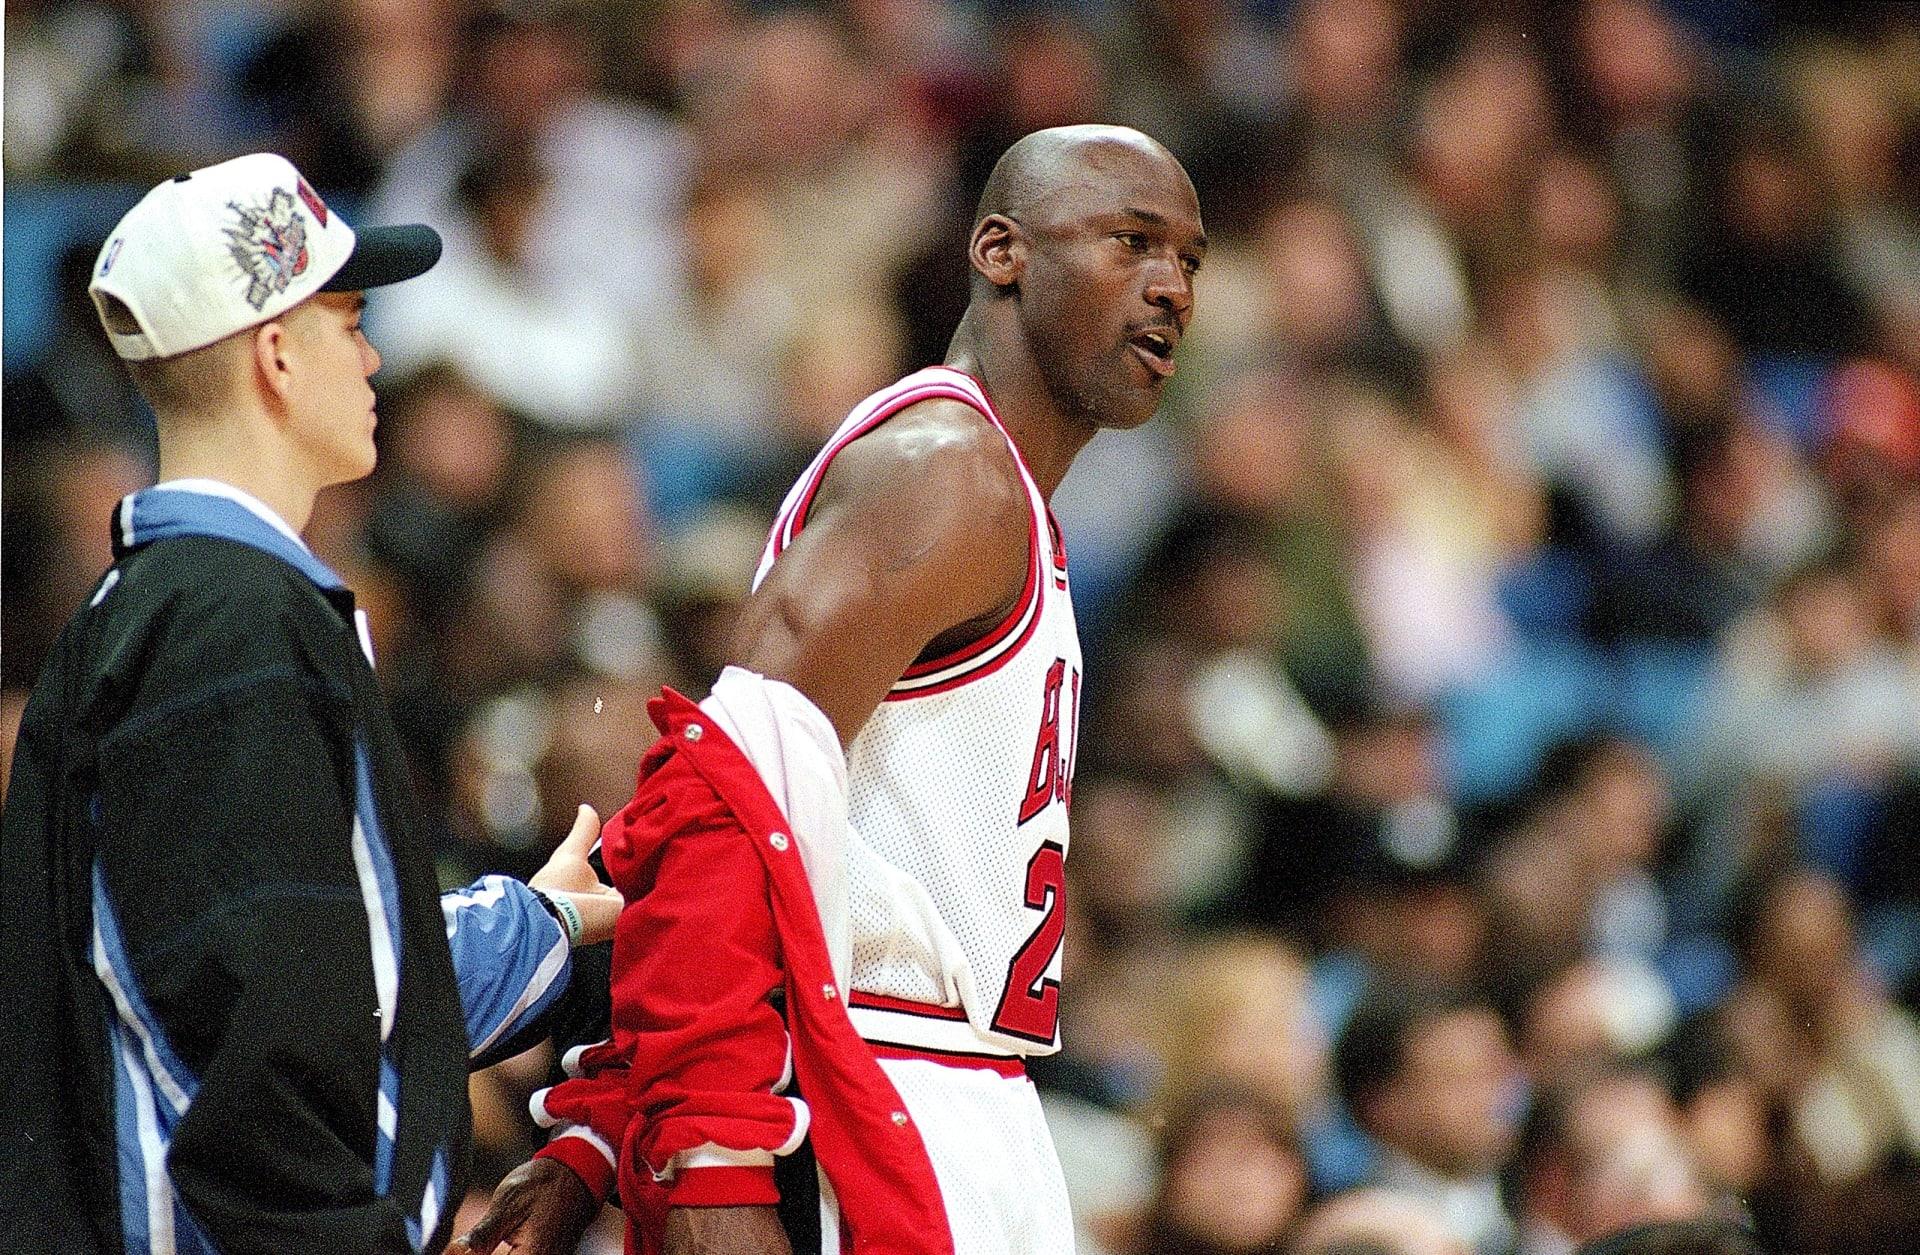 wholesale dealer 313ff 9a9e4 Michael Jordan 1997 NBA All-Star Game Getty